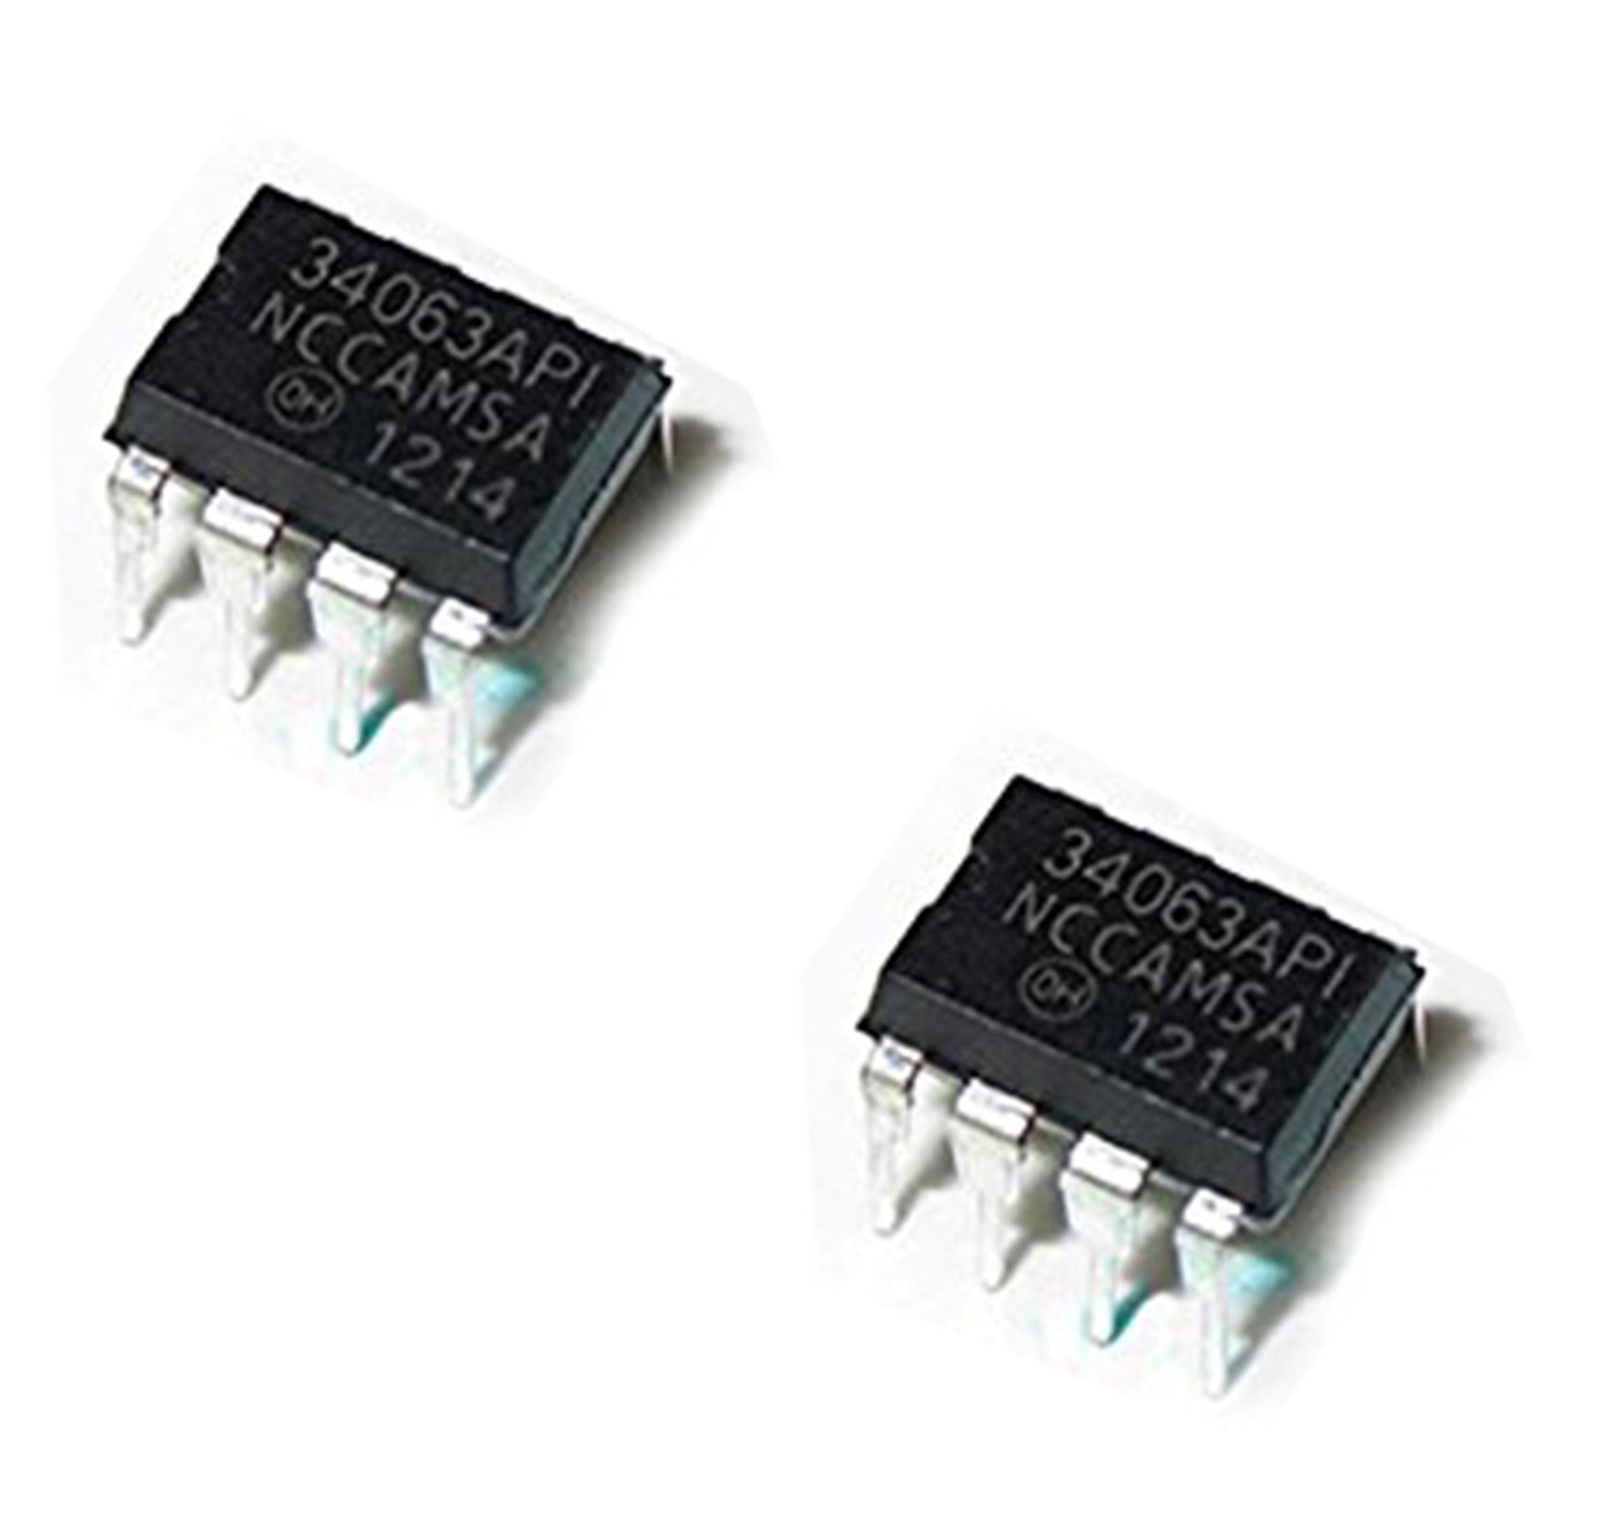 2 X Mc34063a Boost Buck Inverting Switching Regulator Ic Dip 8 All The Stepup Converter